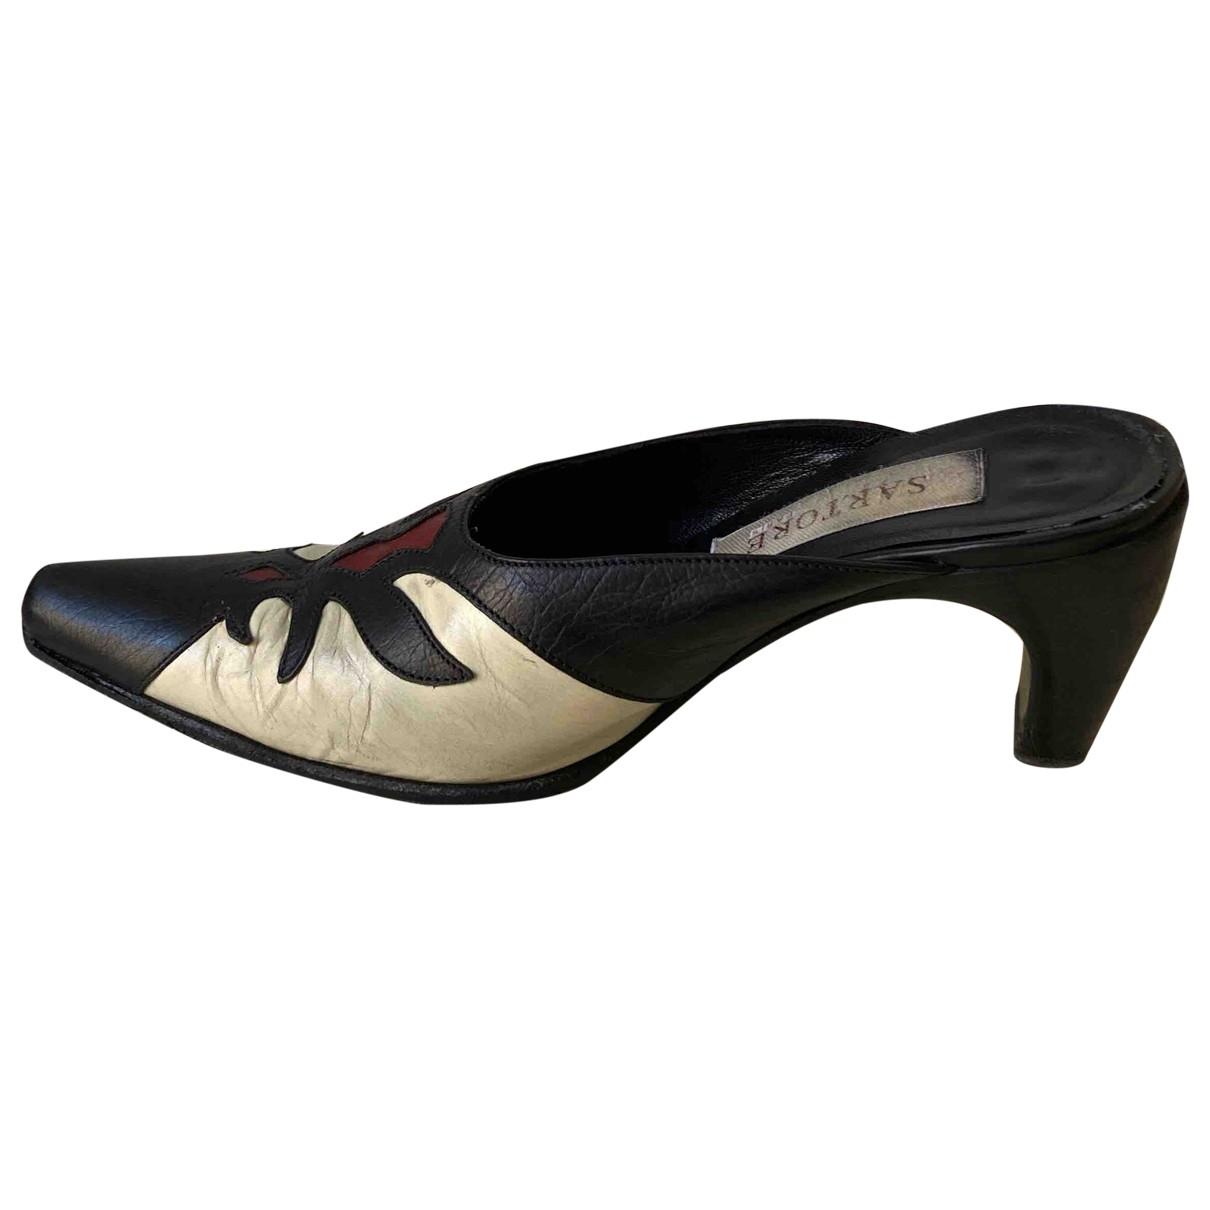 Sartore \N Multicolour Leather Sandals for Women 37.5 EU